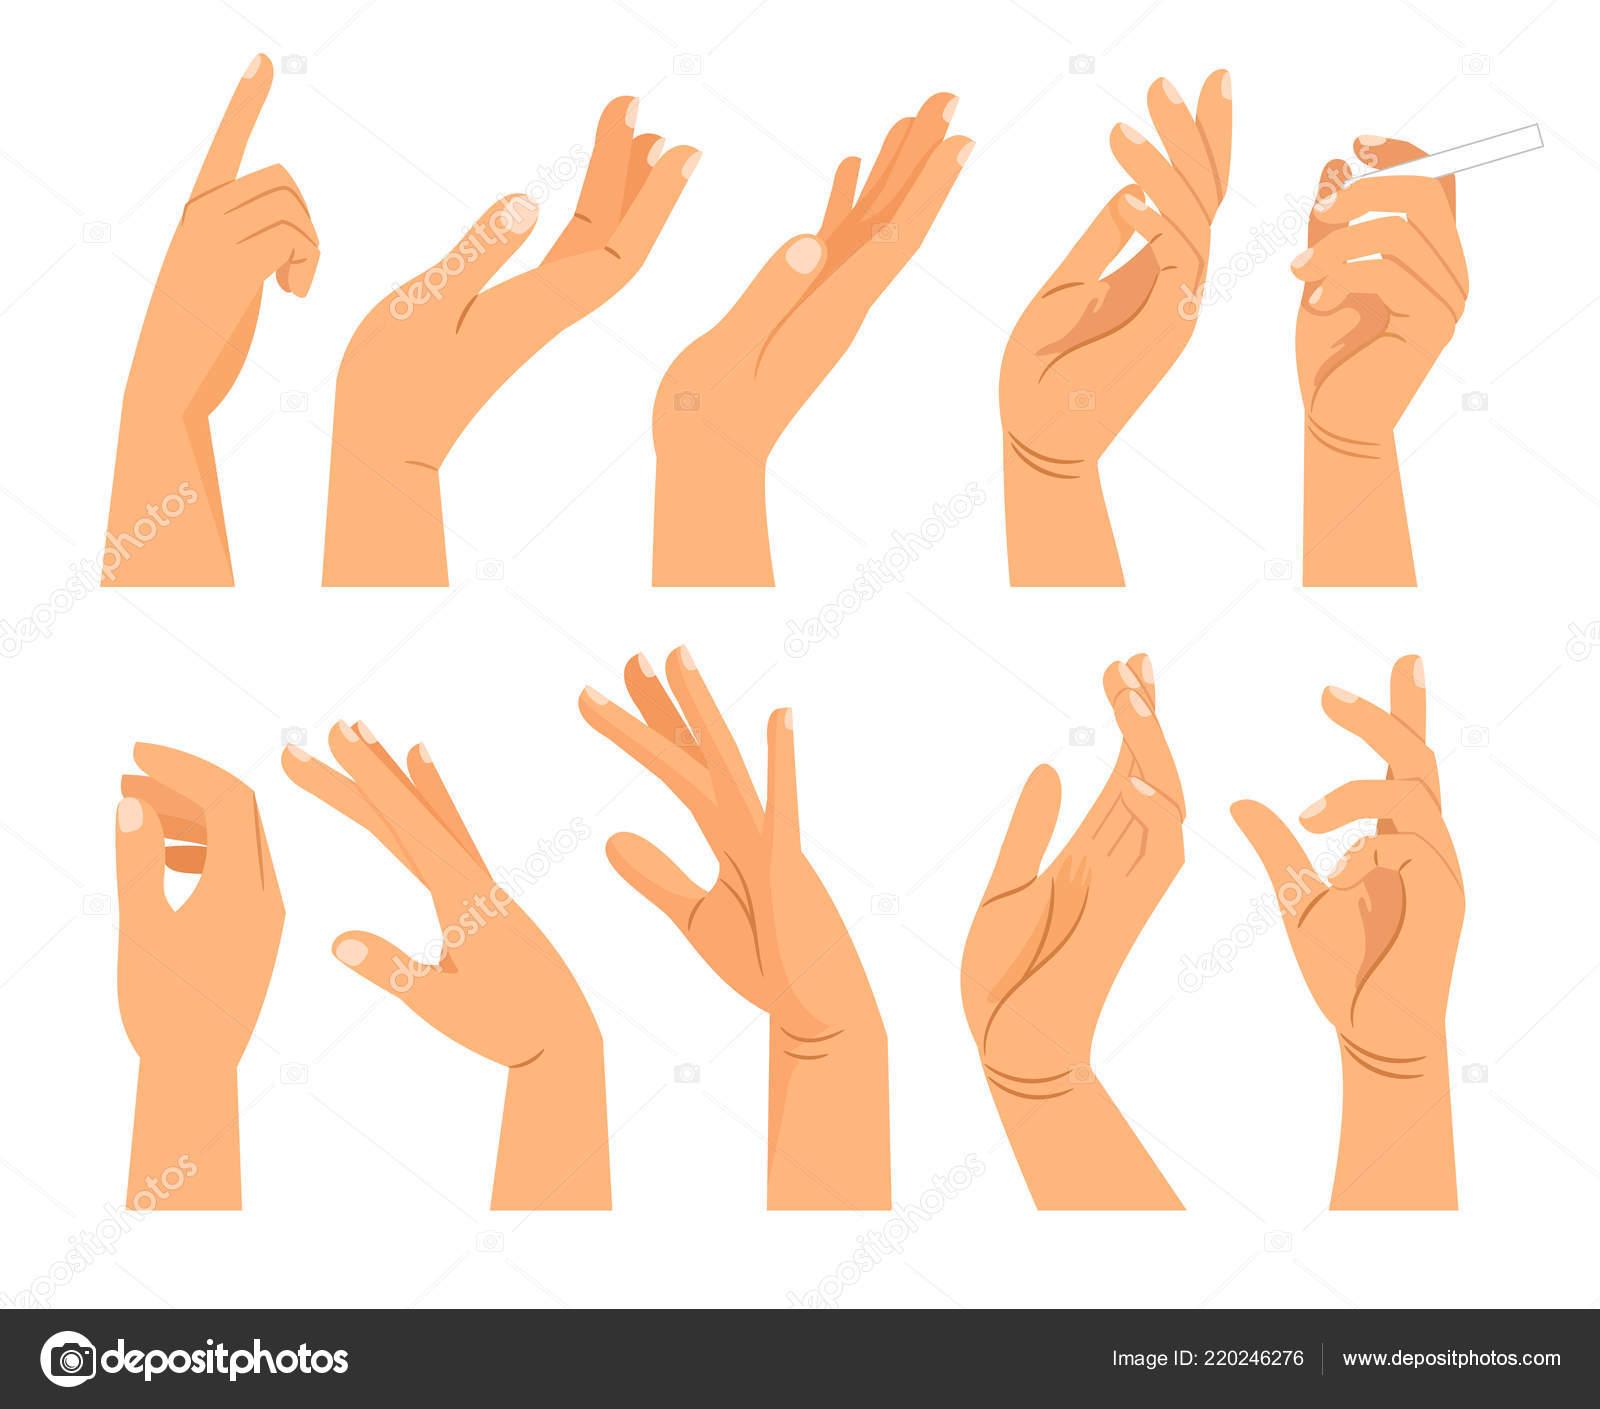 hand gestures in different